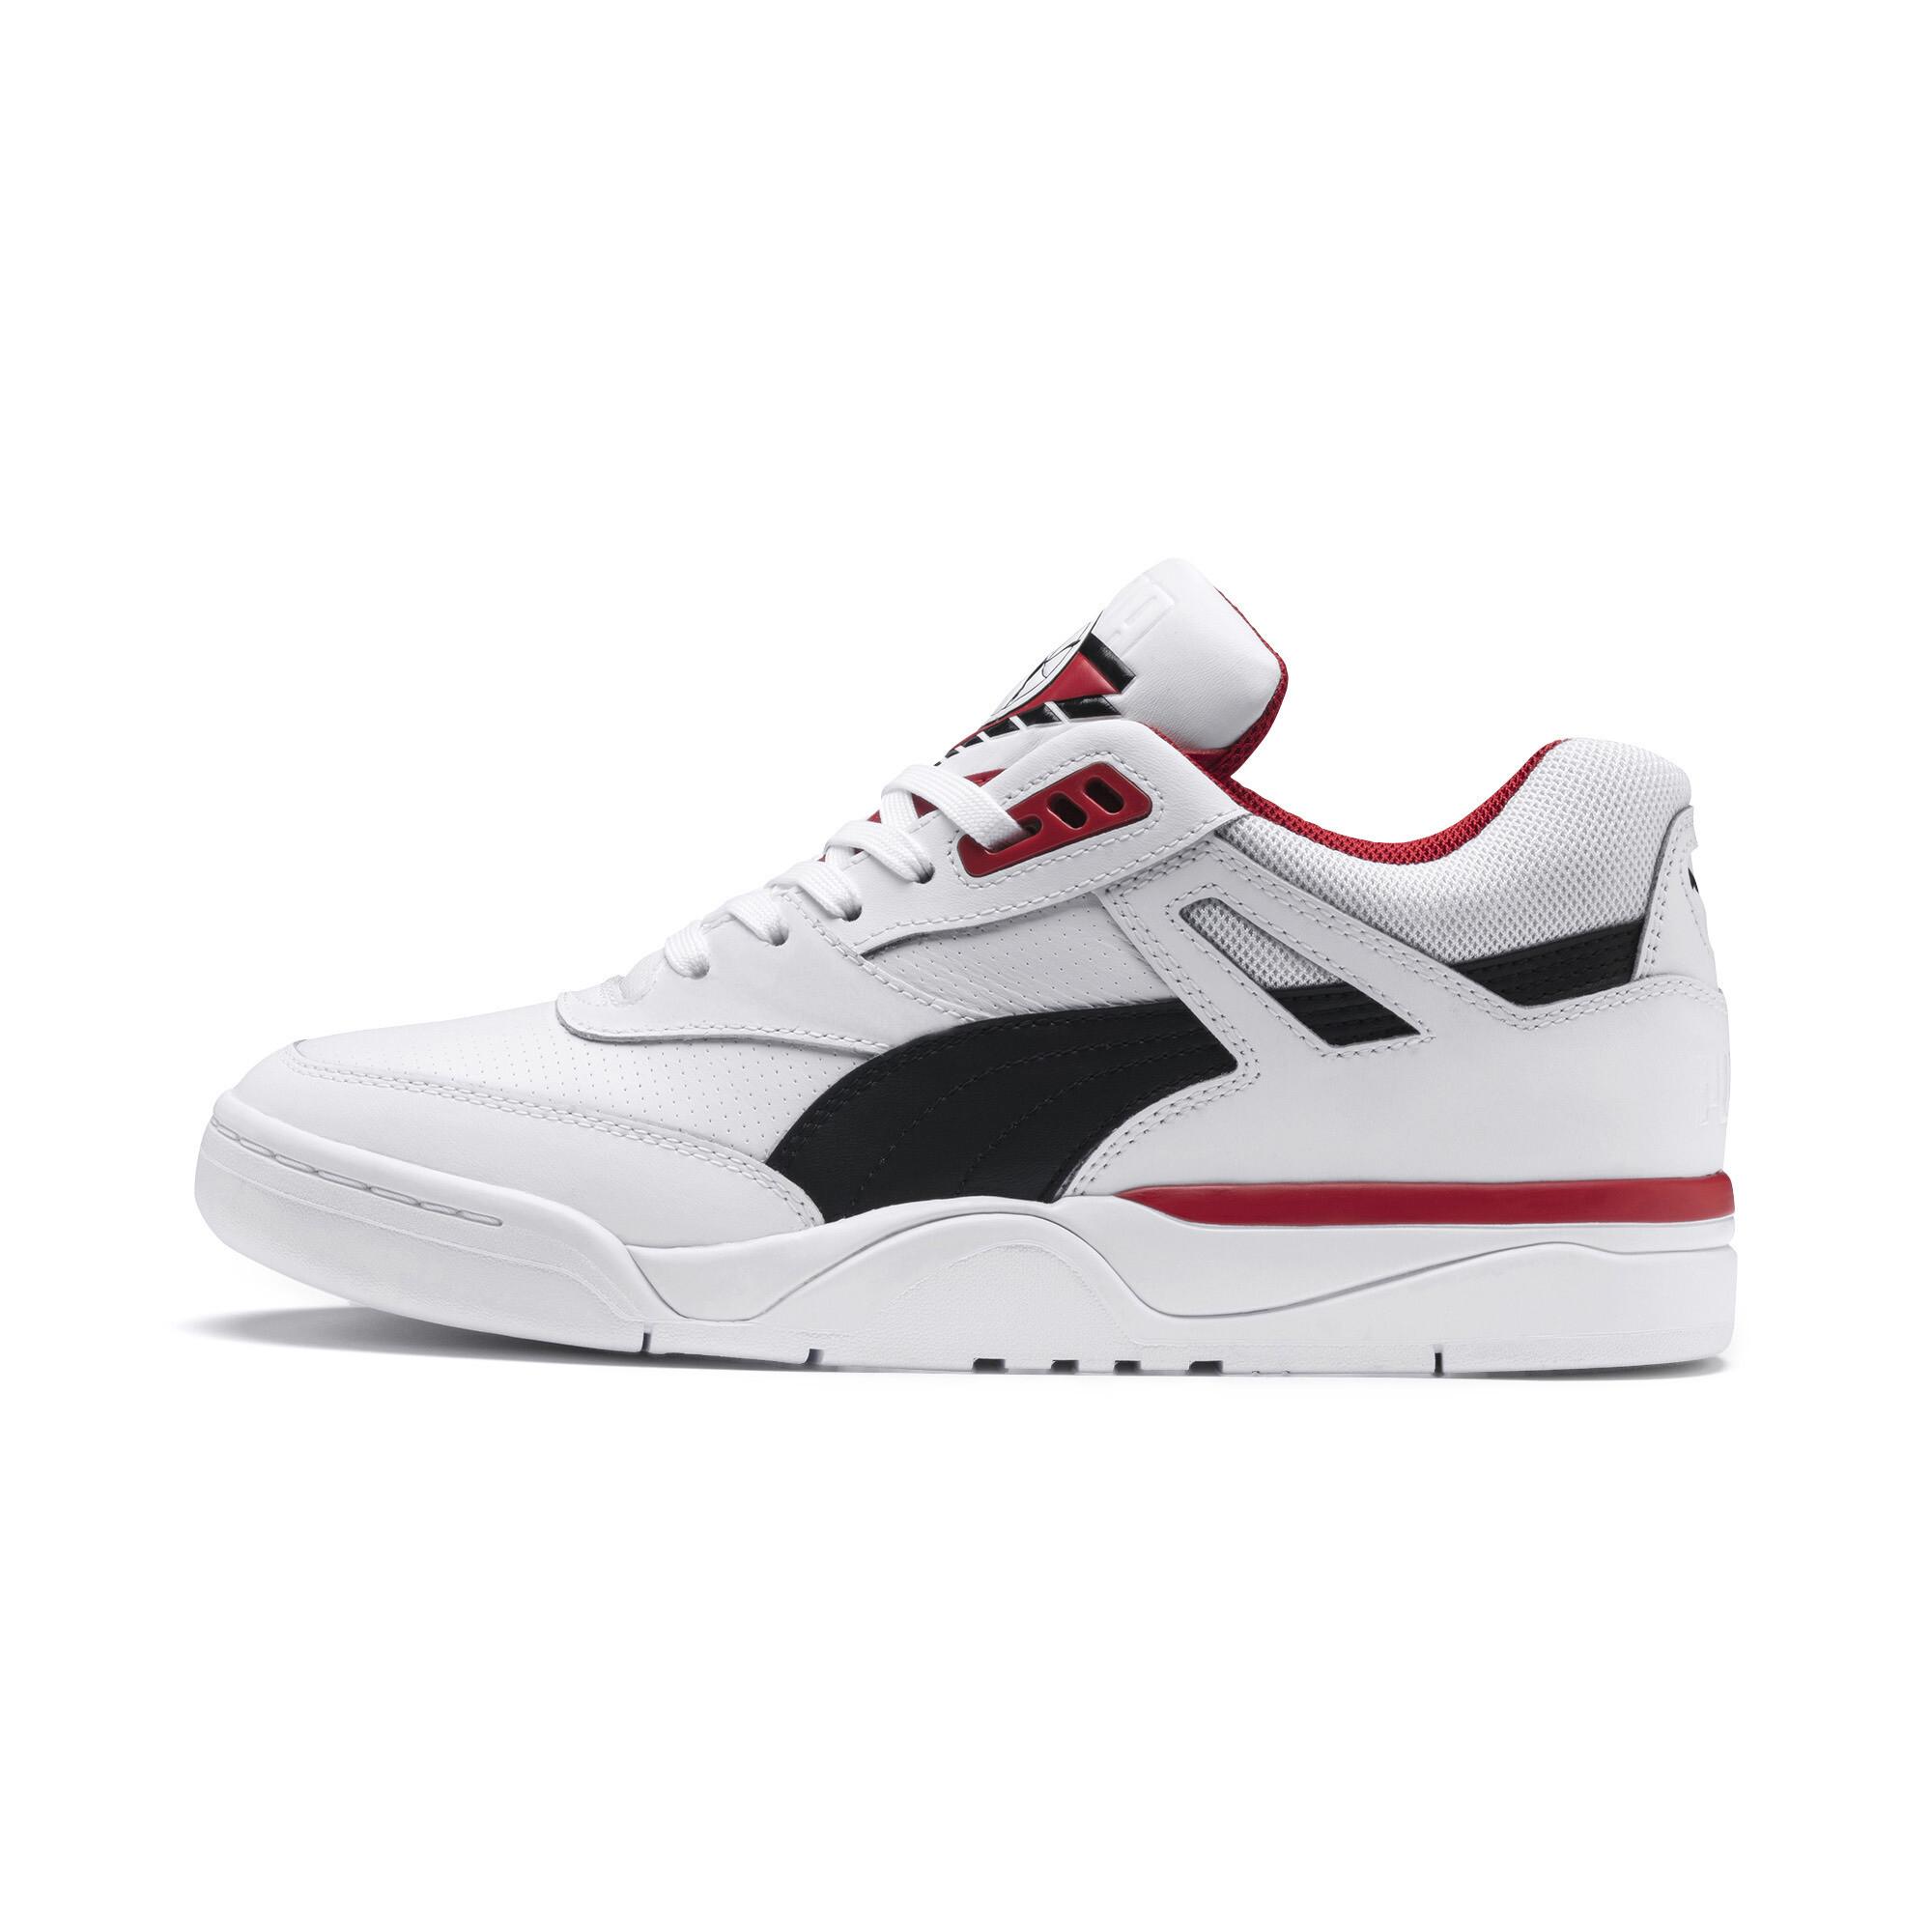 Indexbild 16 - PUMA Palace Guard Sneaker Unisex Schuhe Sport Classics Neu